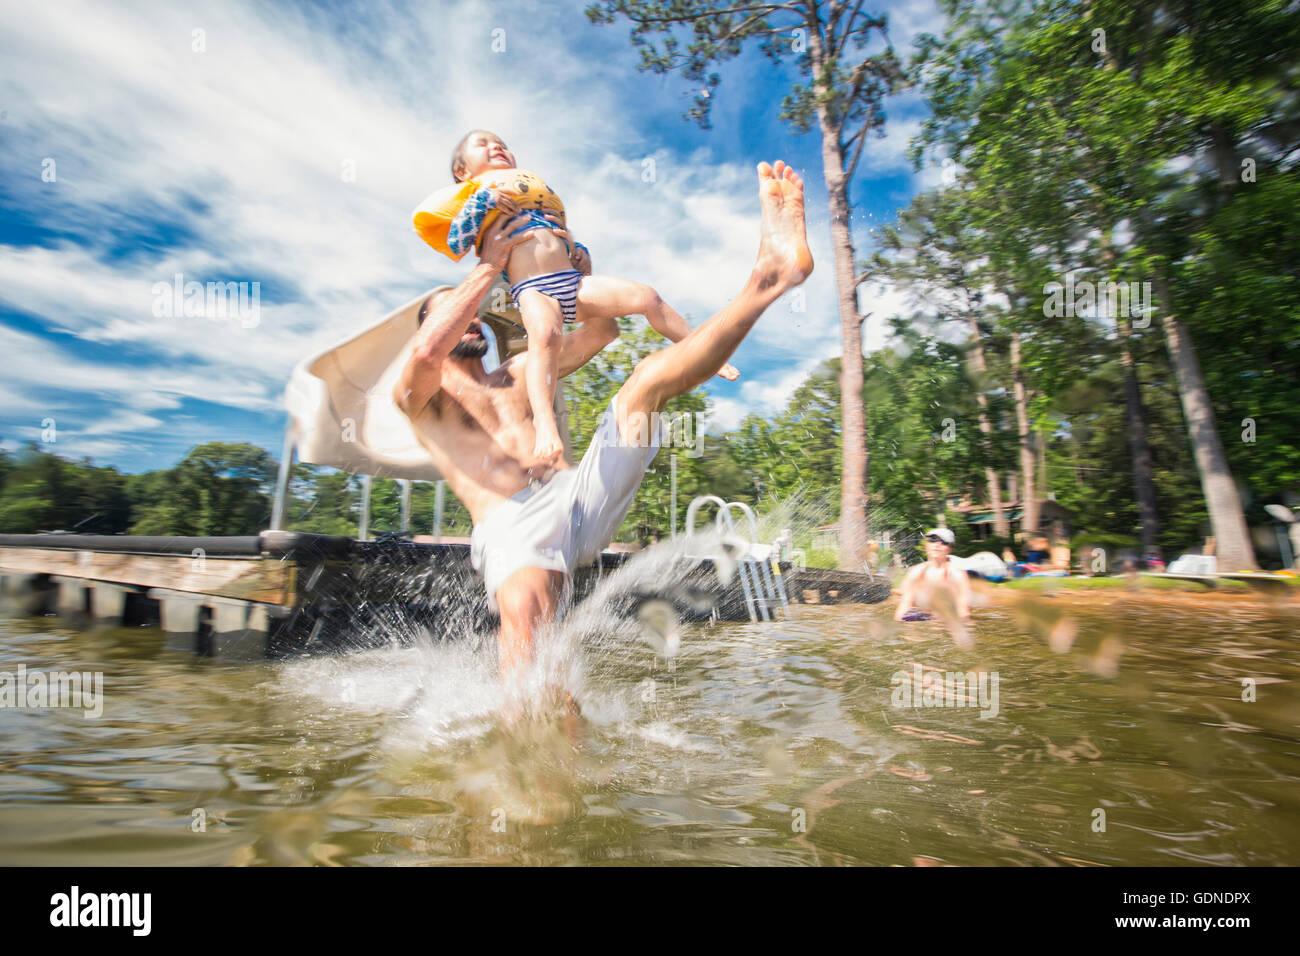 Man holding up daughter jumping from slide at Jackson Lake, Georgia, USA - Stock Image